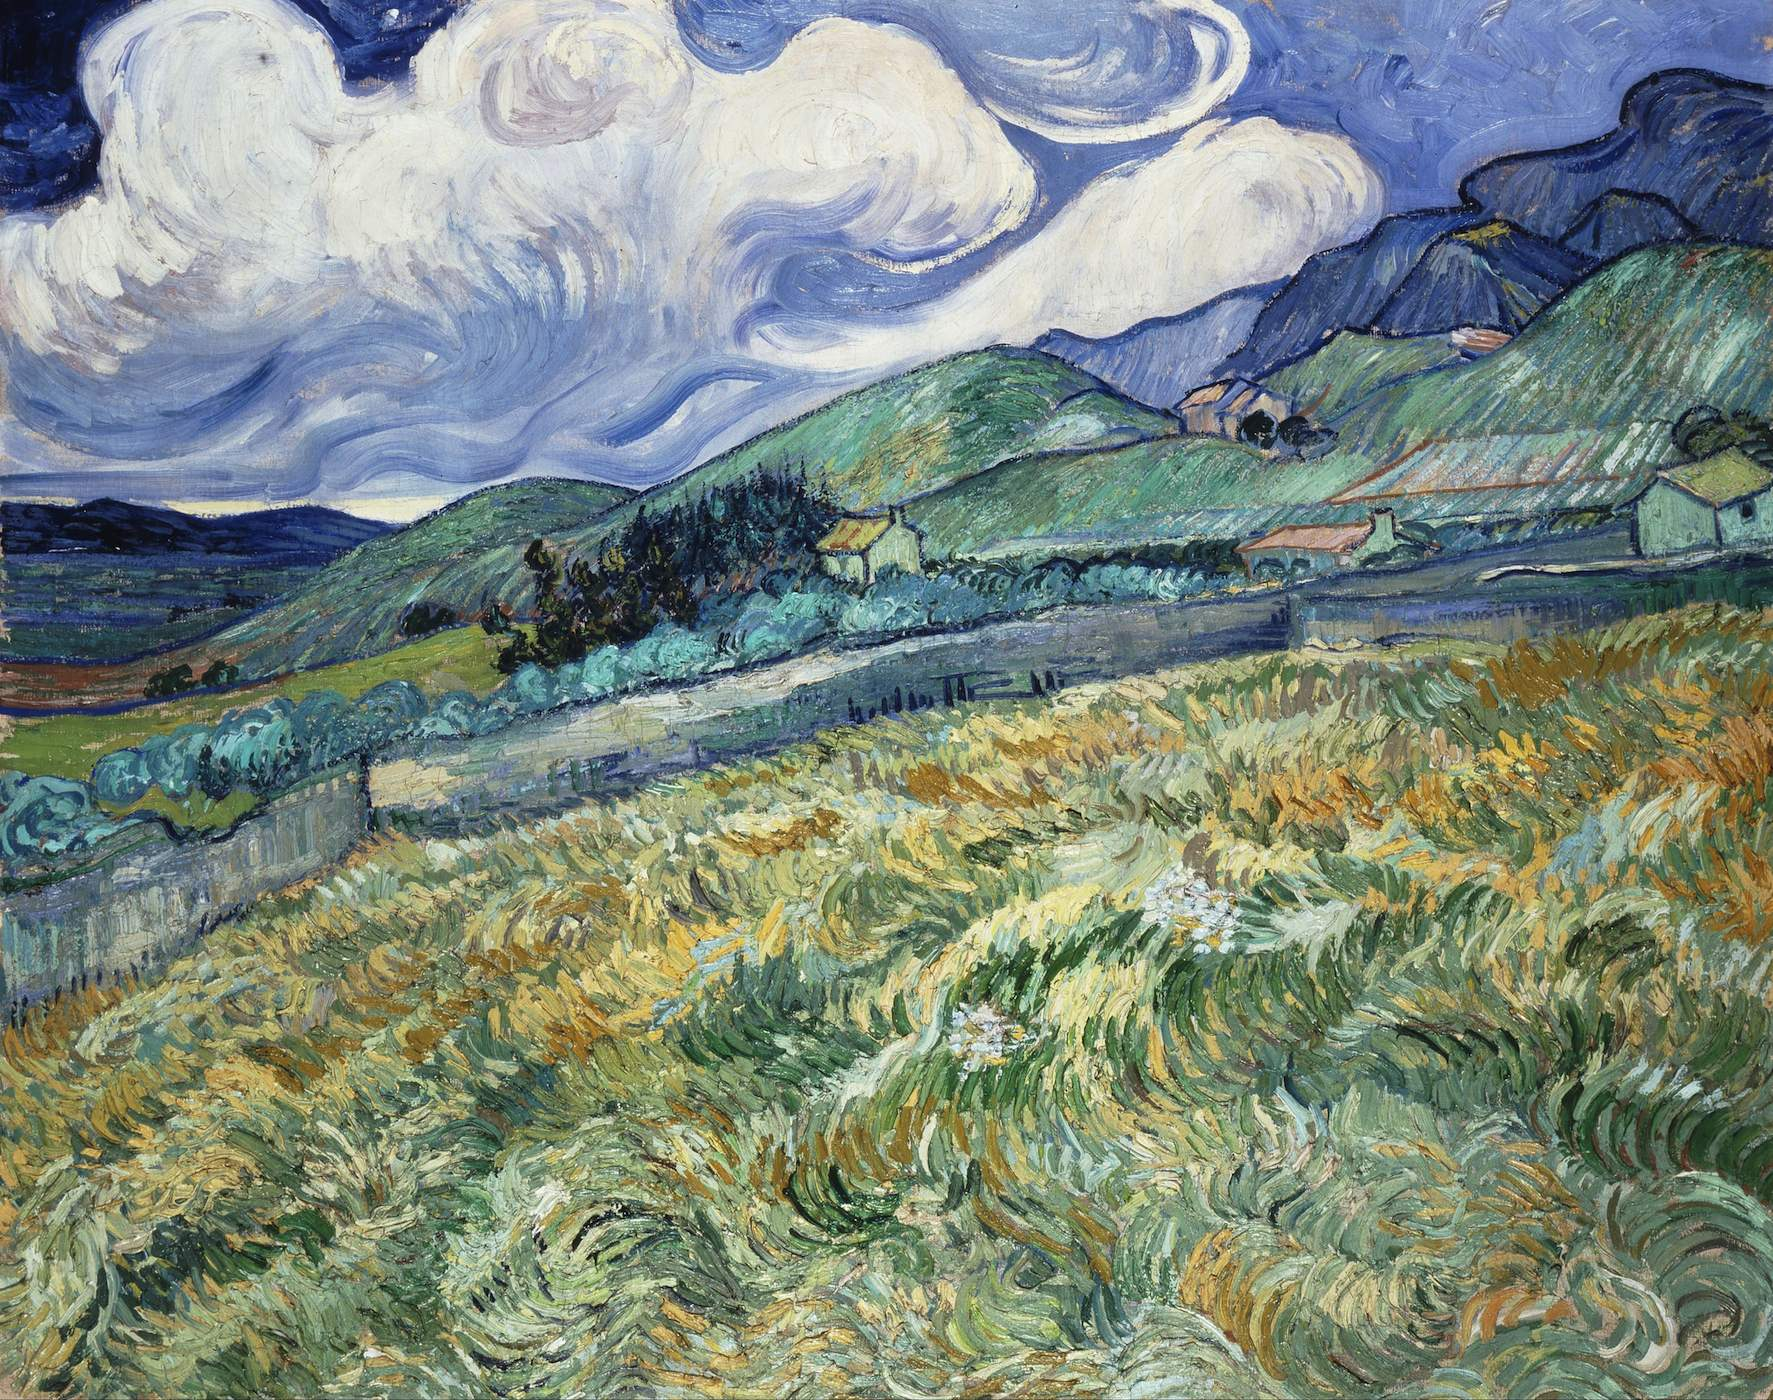 Van Gogh 1889 Champ de ble apres l'orage Ny Carlsberg Glyptotek Copenhague F611